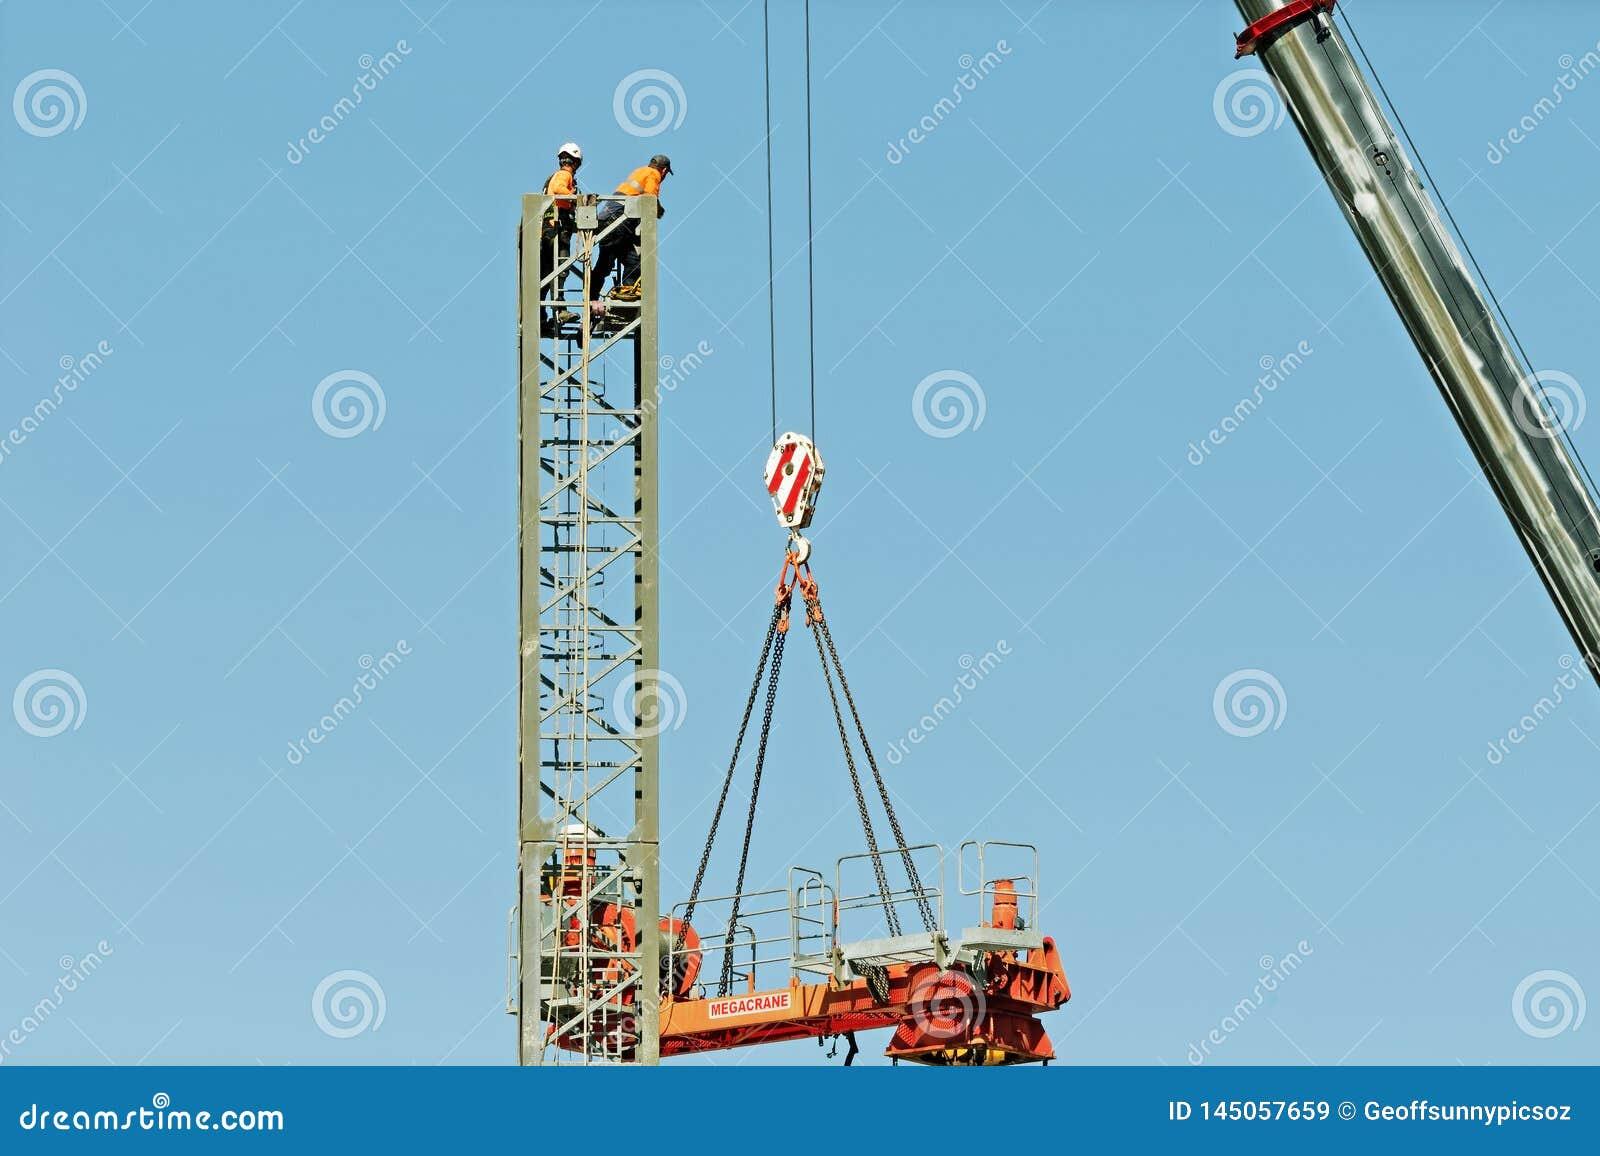 Construction crane removal. Update ed319. Gosford. April 9, 2019